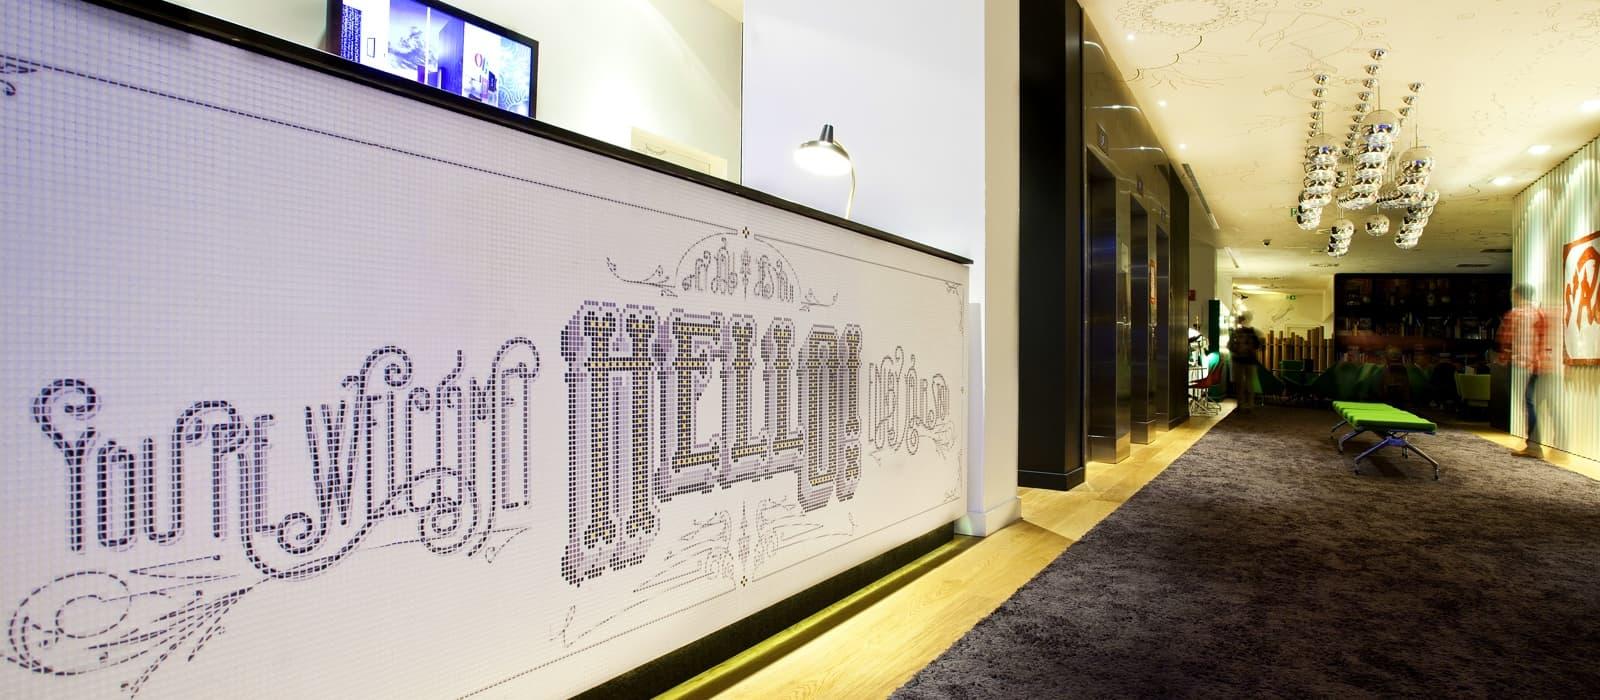 Bit Hotel Barcelona - Vincci Hoteles